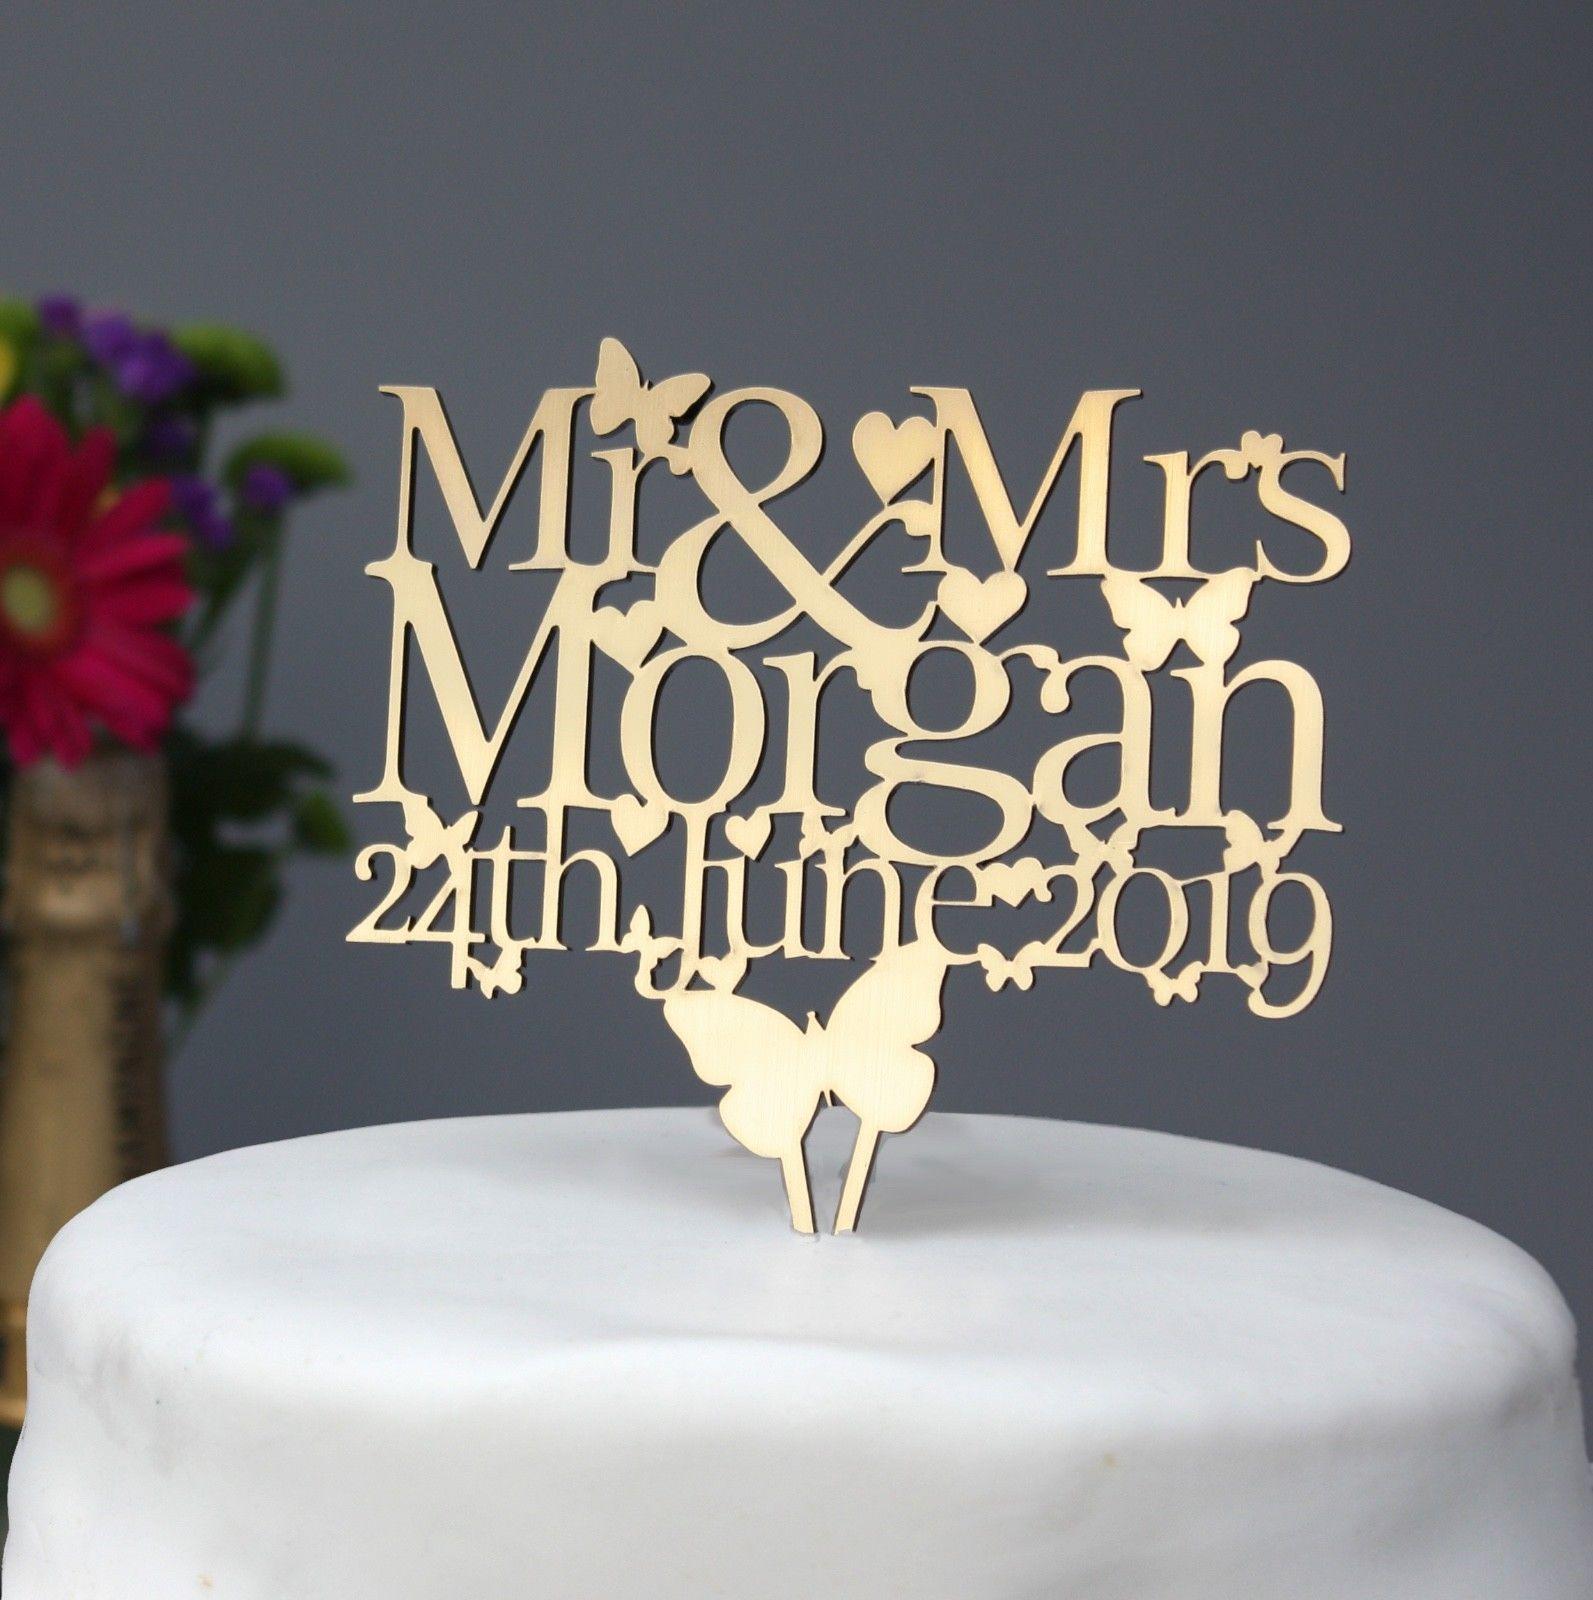 Weddinganniversary cake topper decoration personalised with name